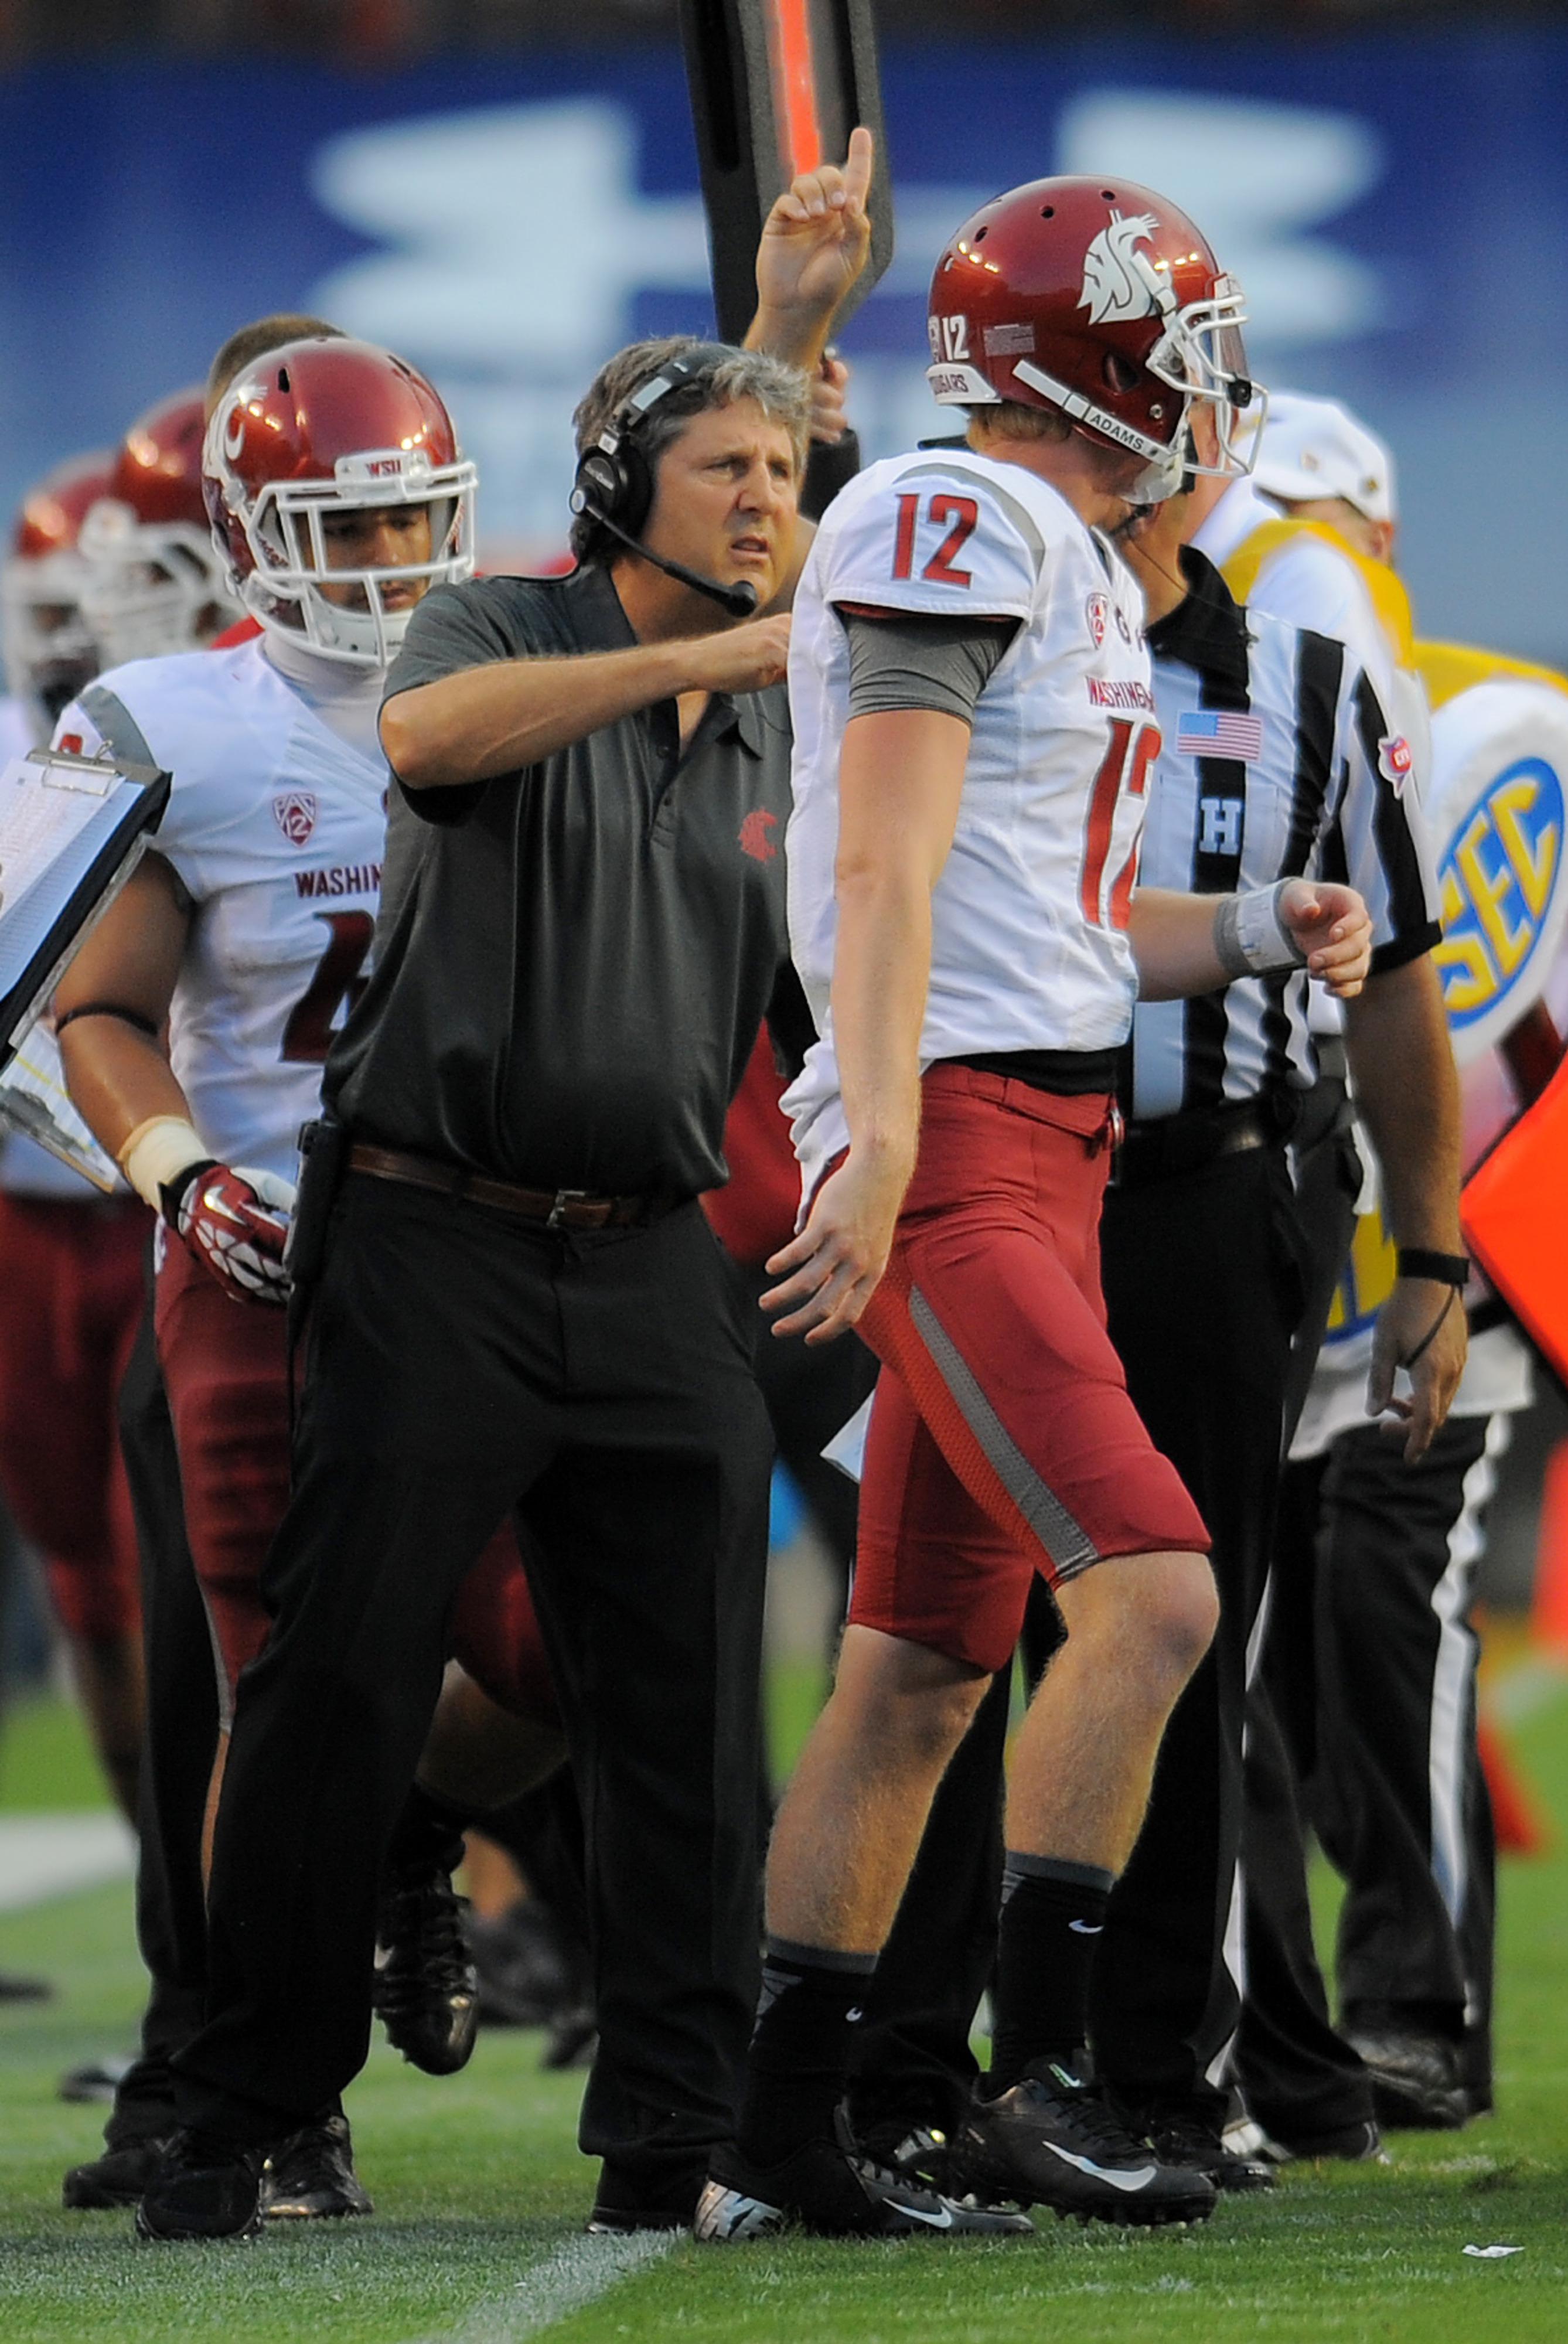 Washington State head coach Mike Leach brings quarterback Connor Halliday (12) and the Air Raid offense to Rice-Eccles Stadium on Sept. 27.